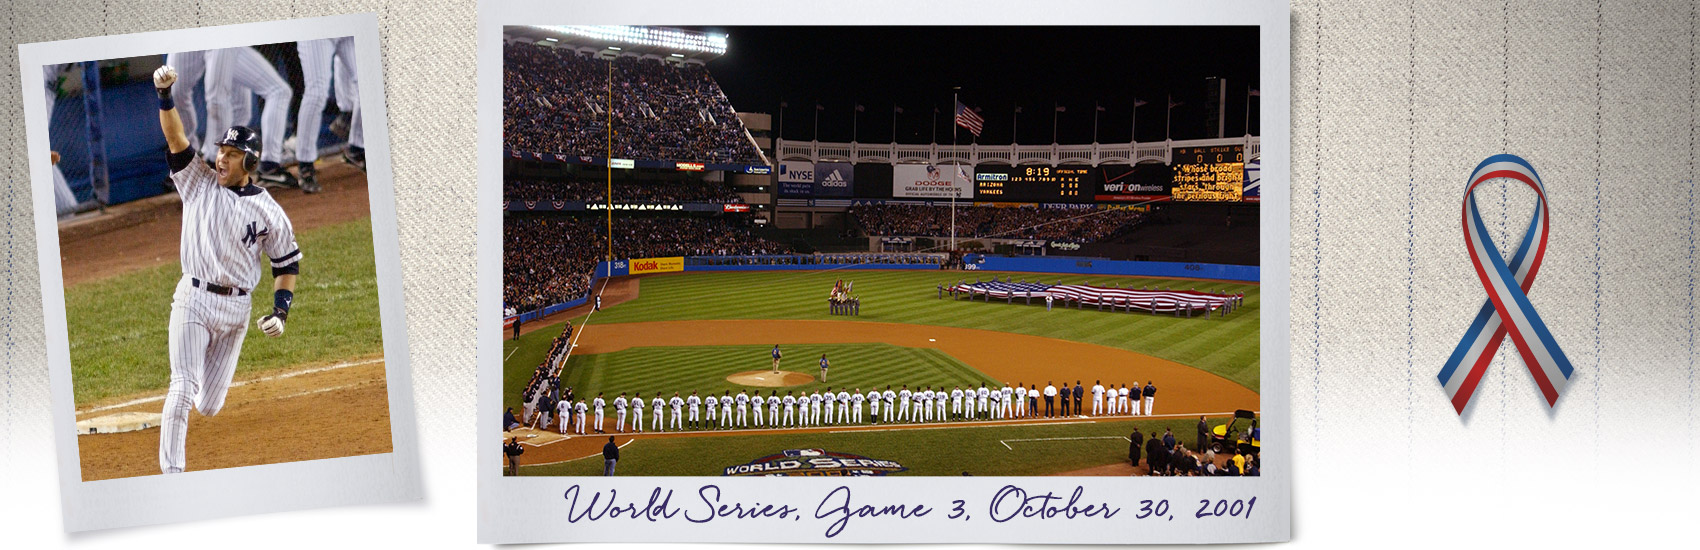 New York Yankees Unite USA Following 911